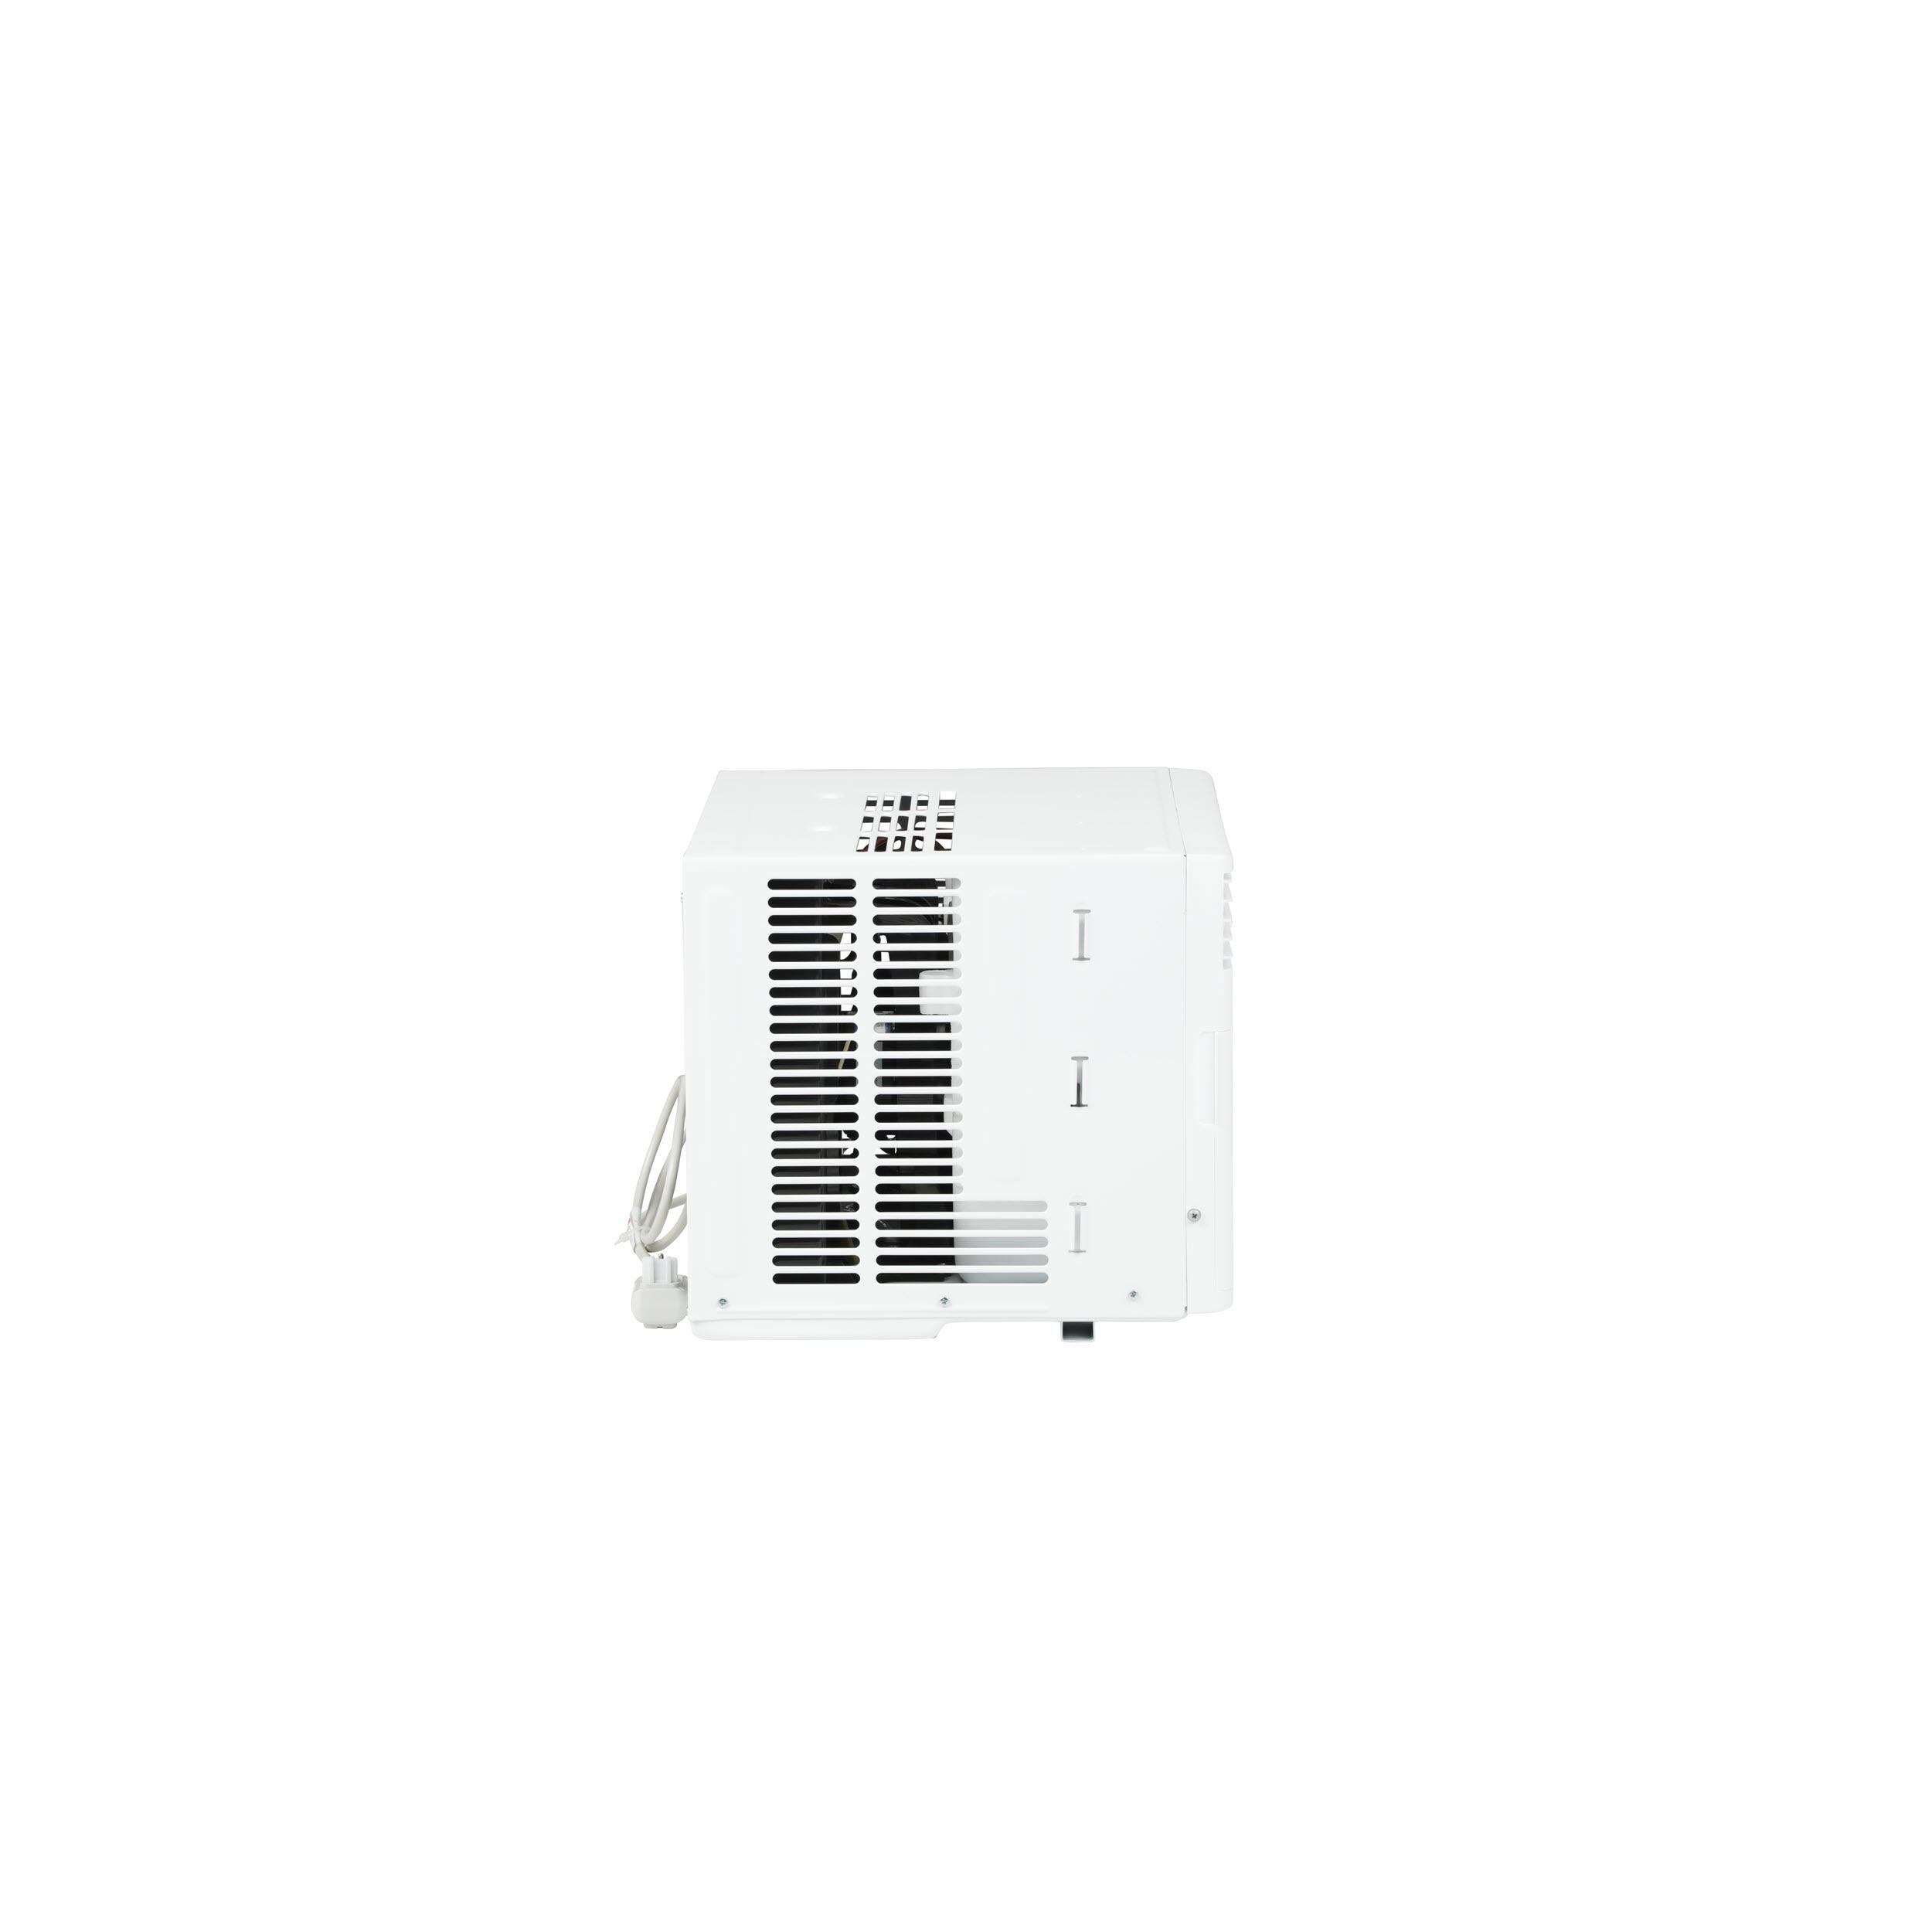 Model: QHM05LX | ENERGY STAR® 115 Volt Room Air Conditioner